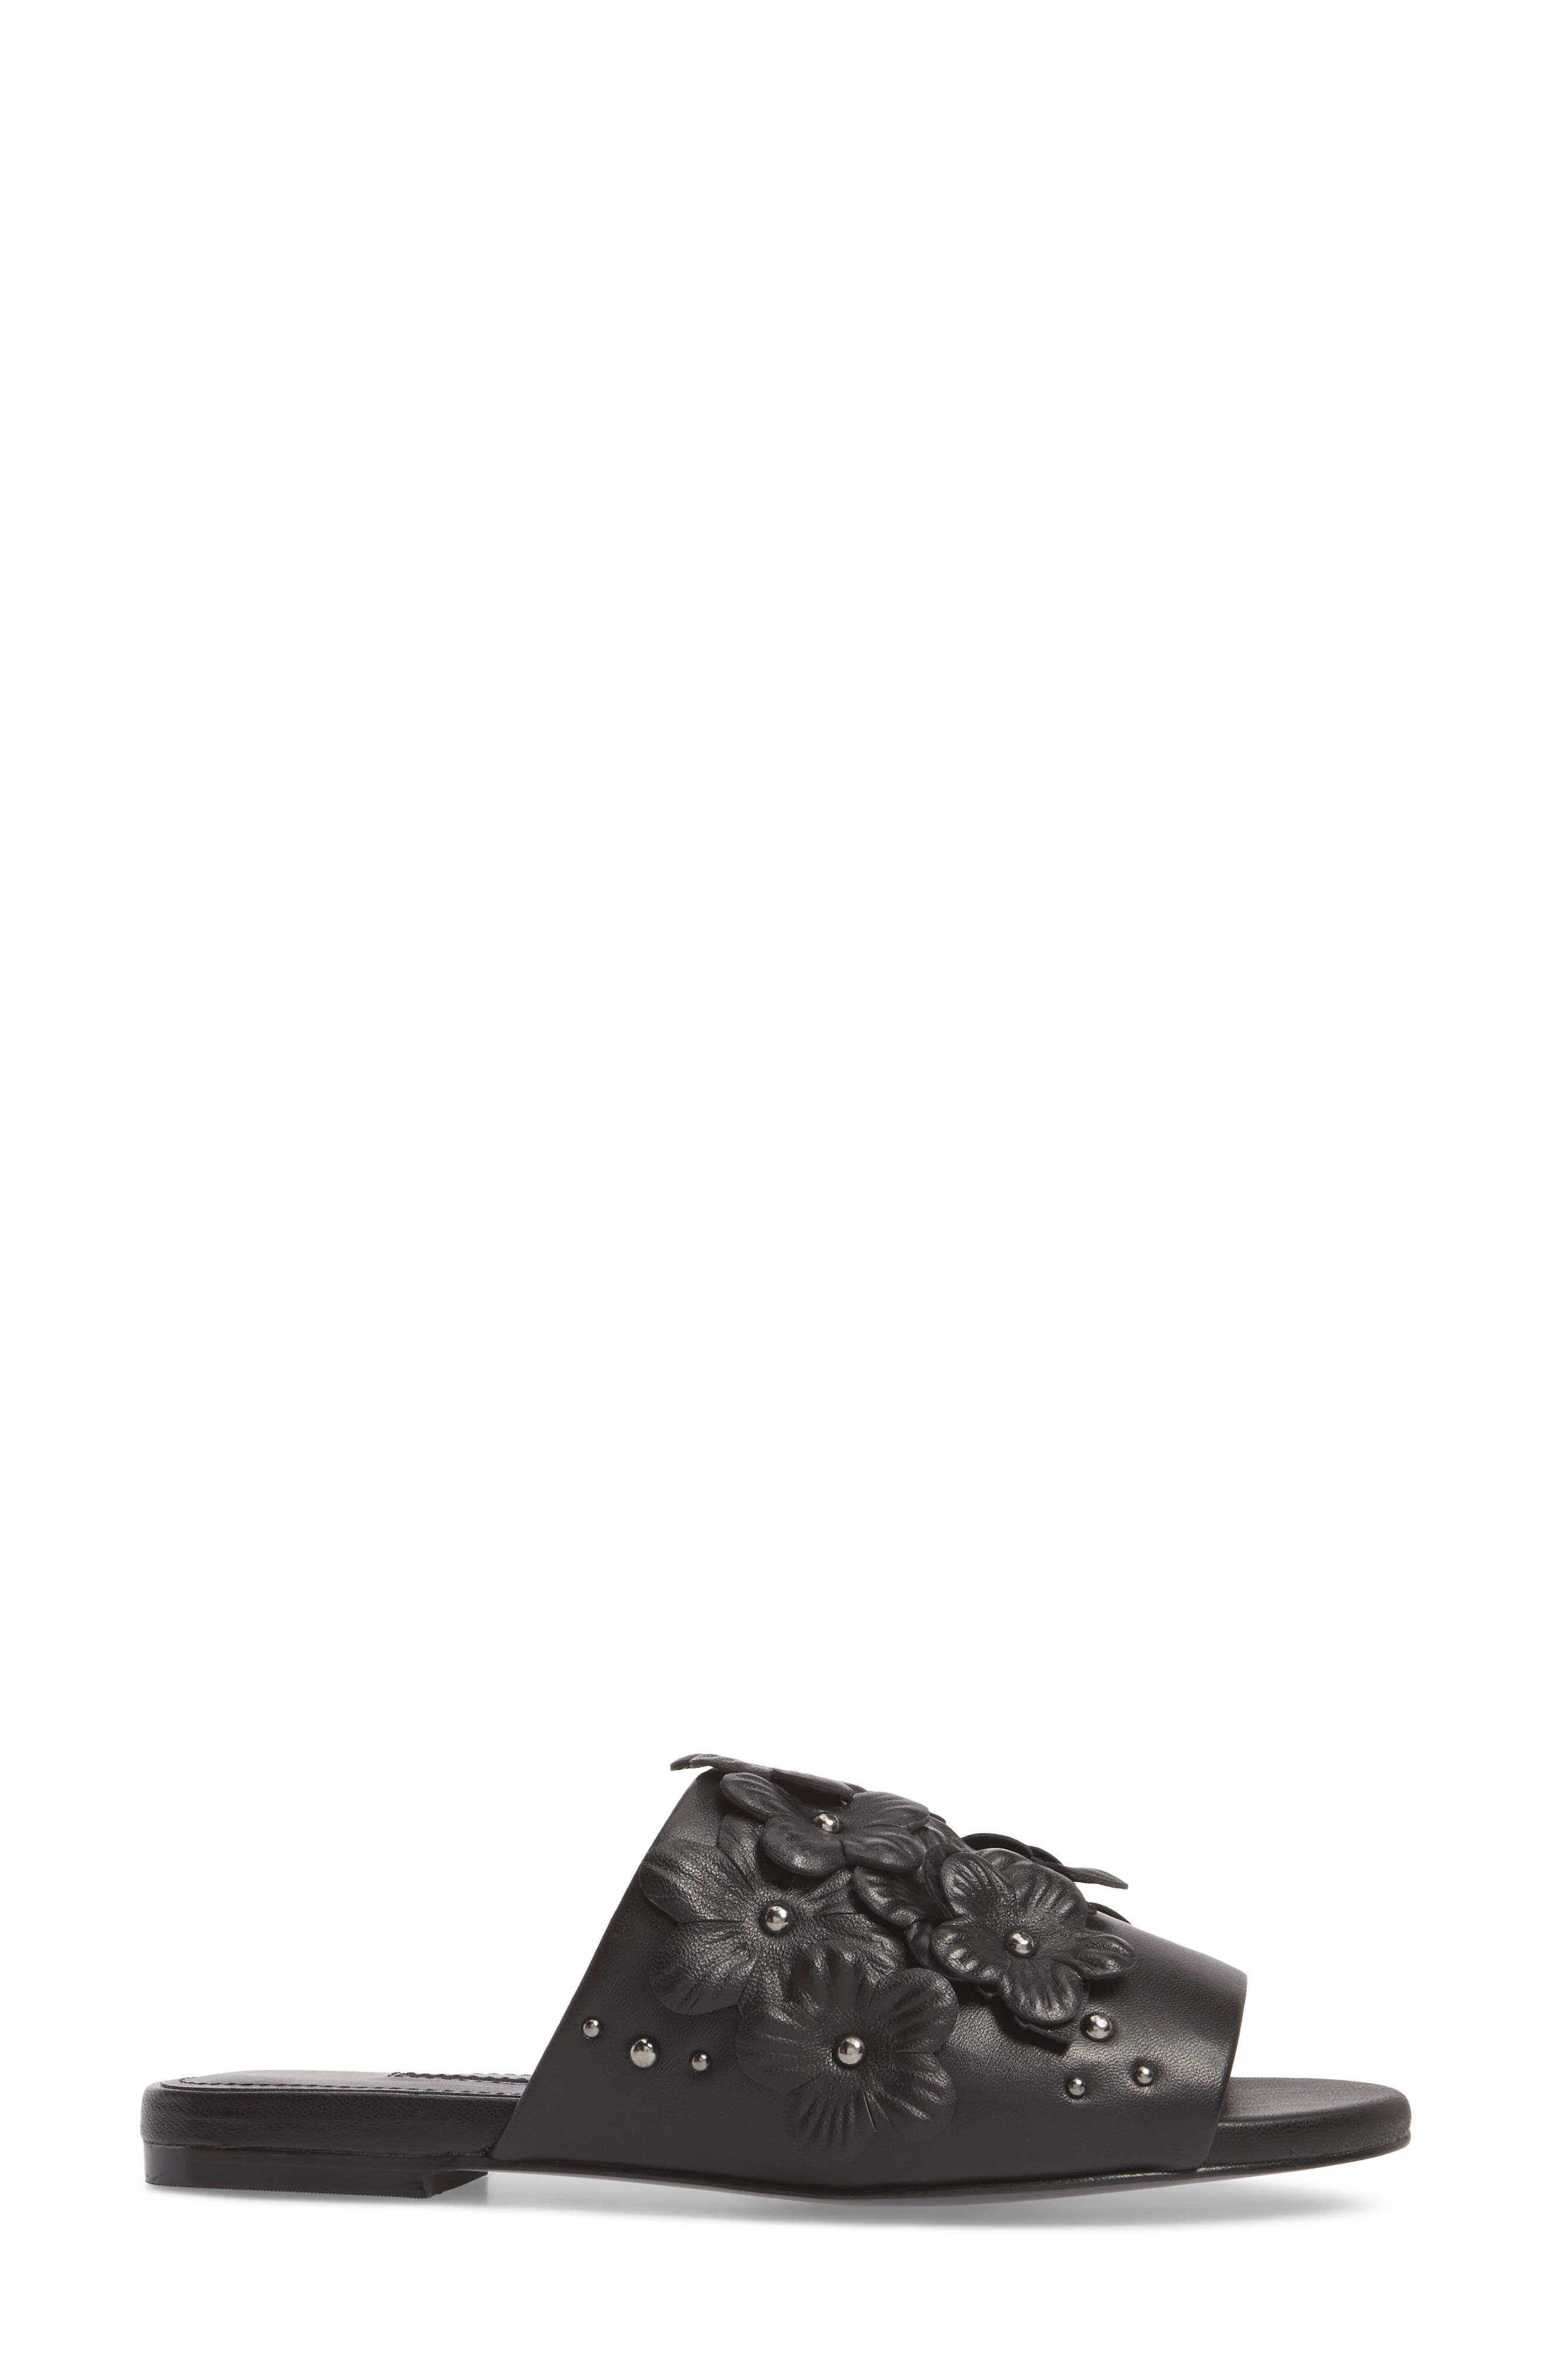 Alternate Image 3  - Charles David Sicilian Slide Sandal (Women)